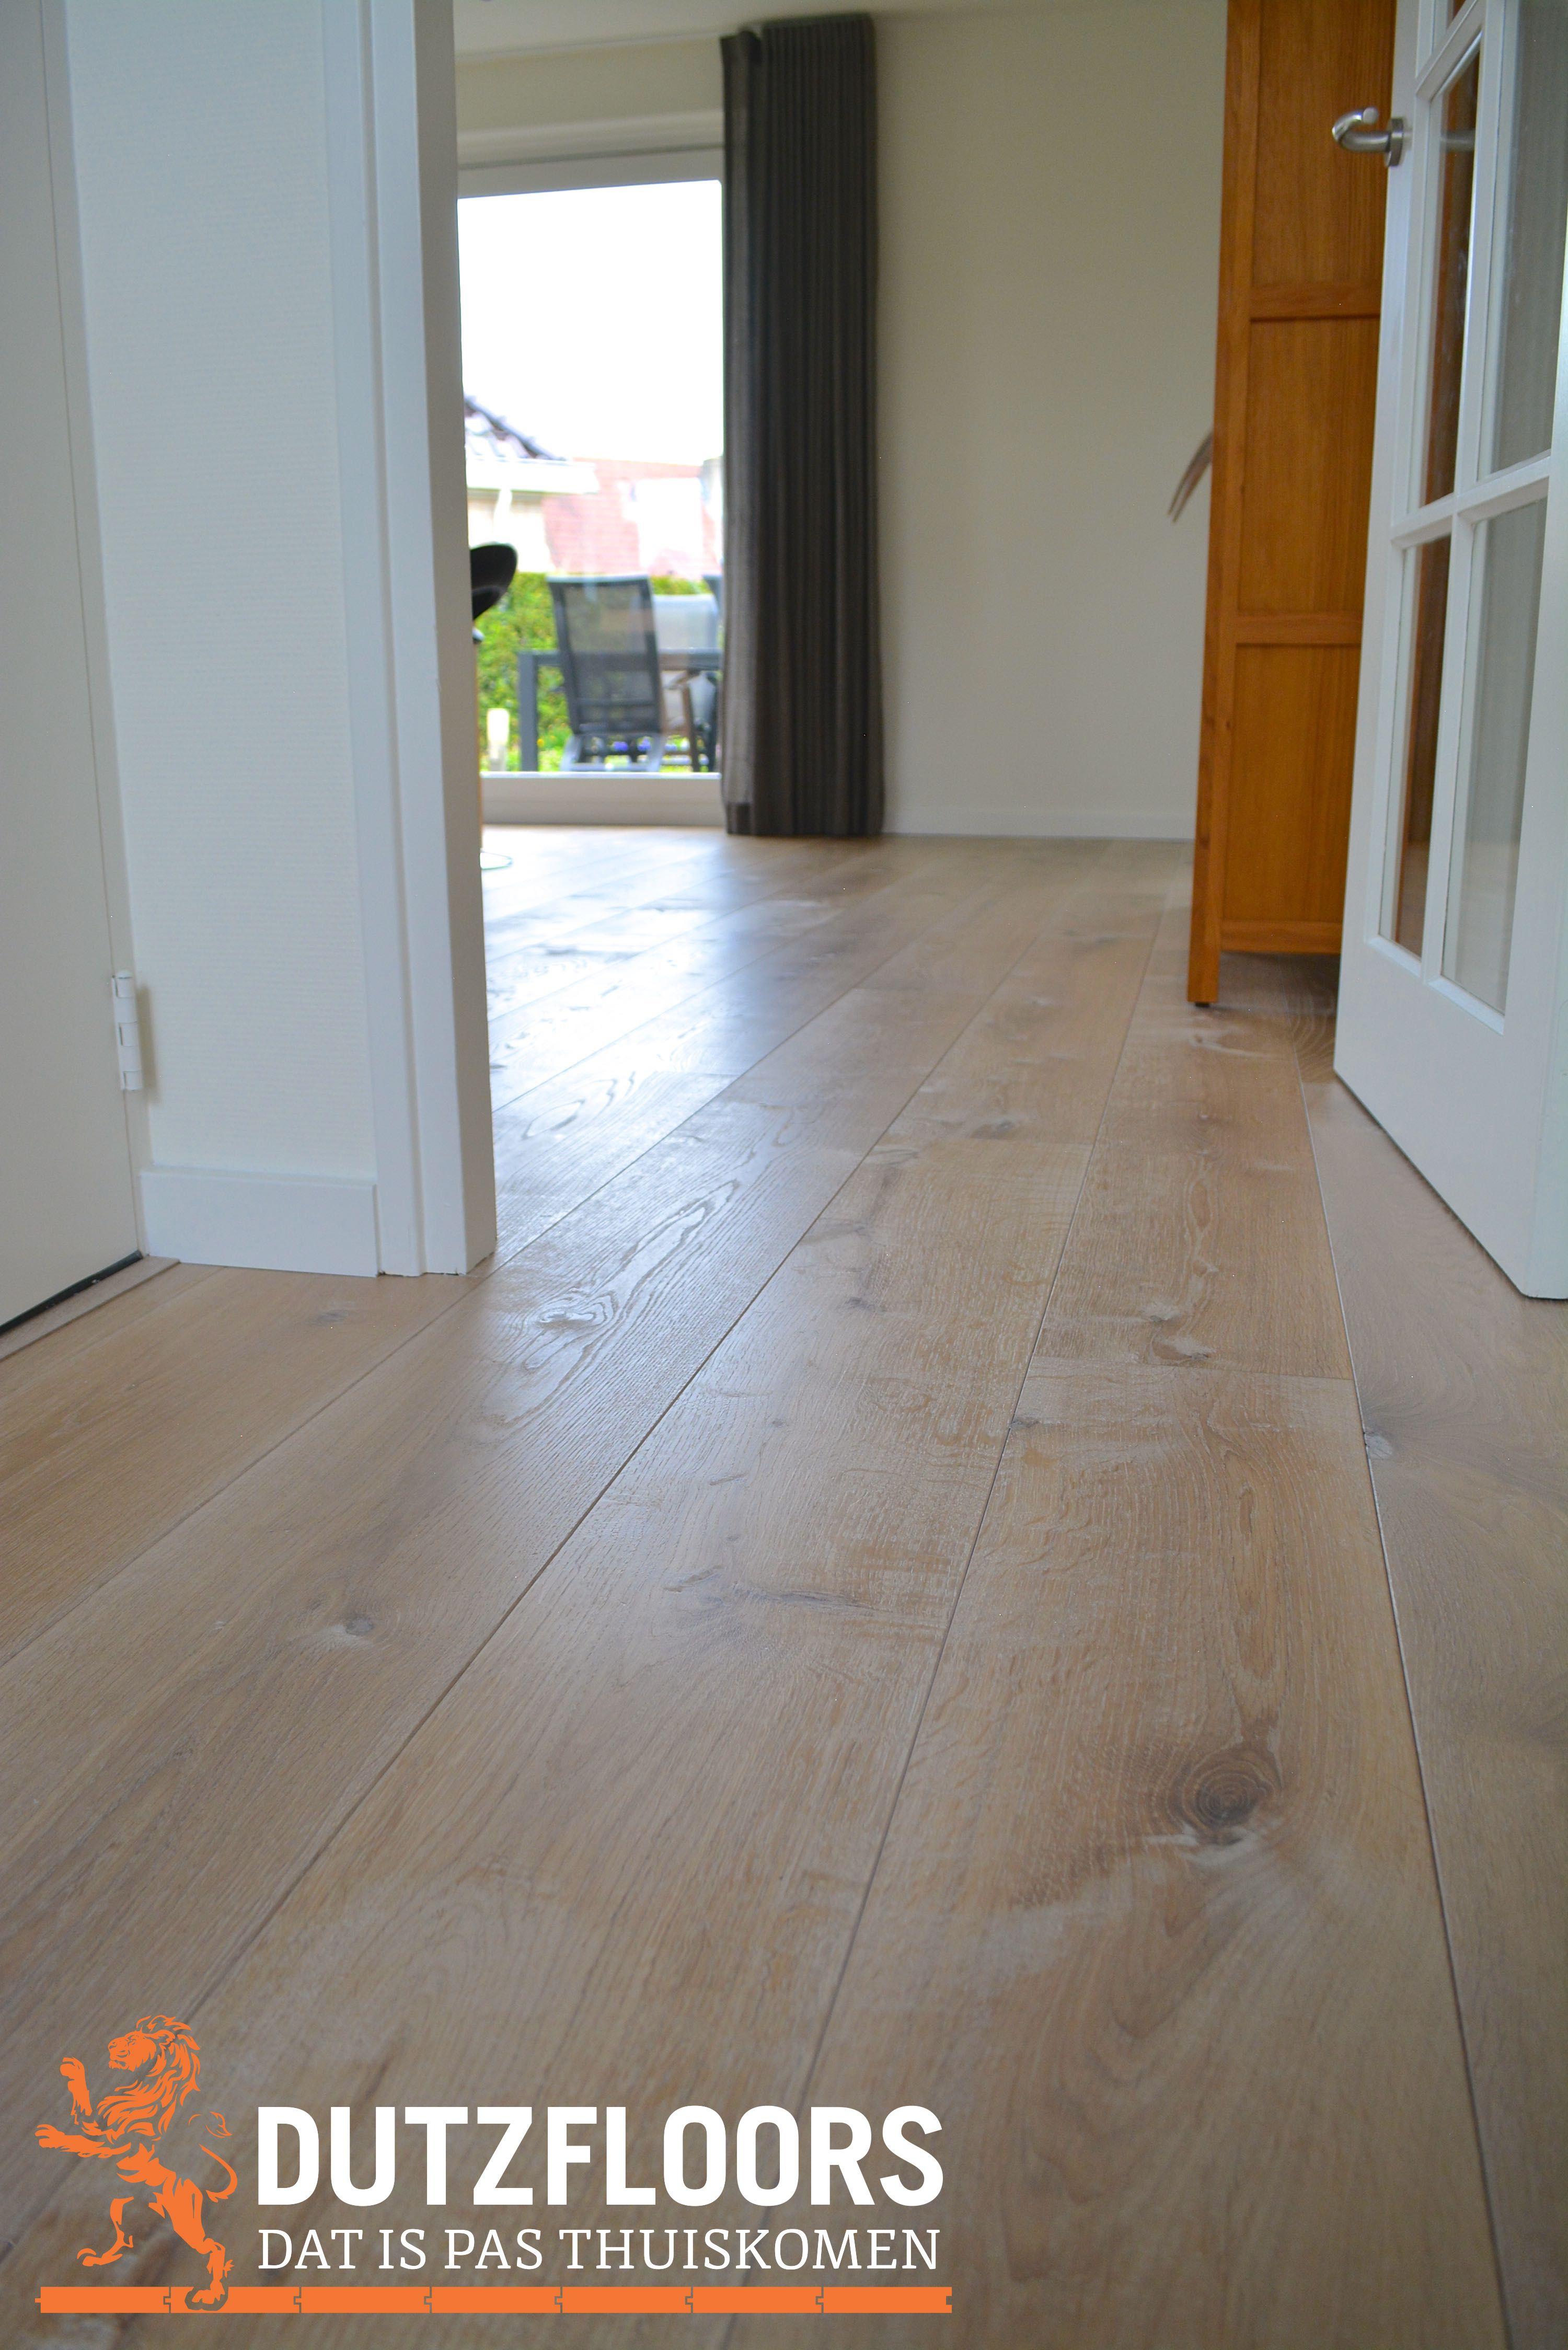 d407a46628abf5 Witte geschaafde houten vloer van hoge kwaliteit Europees eiken ...